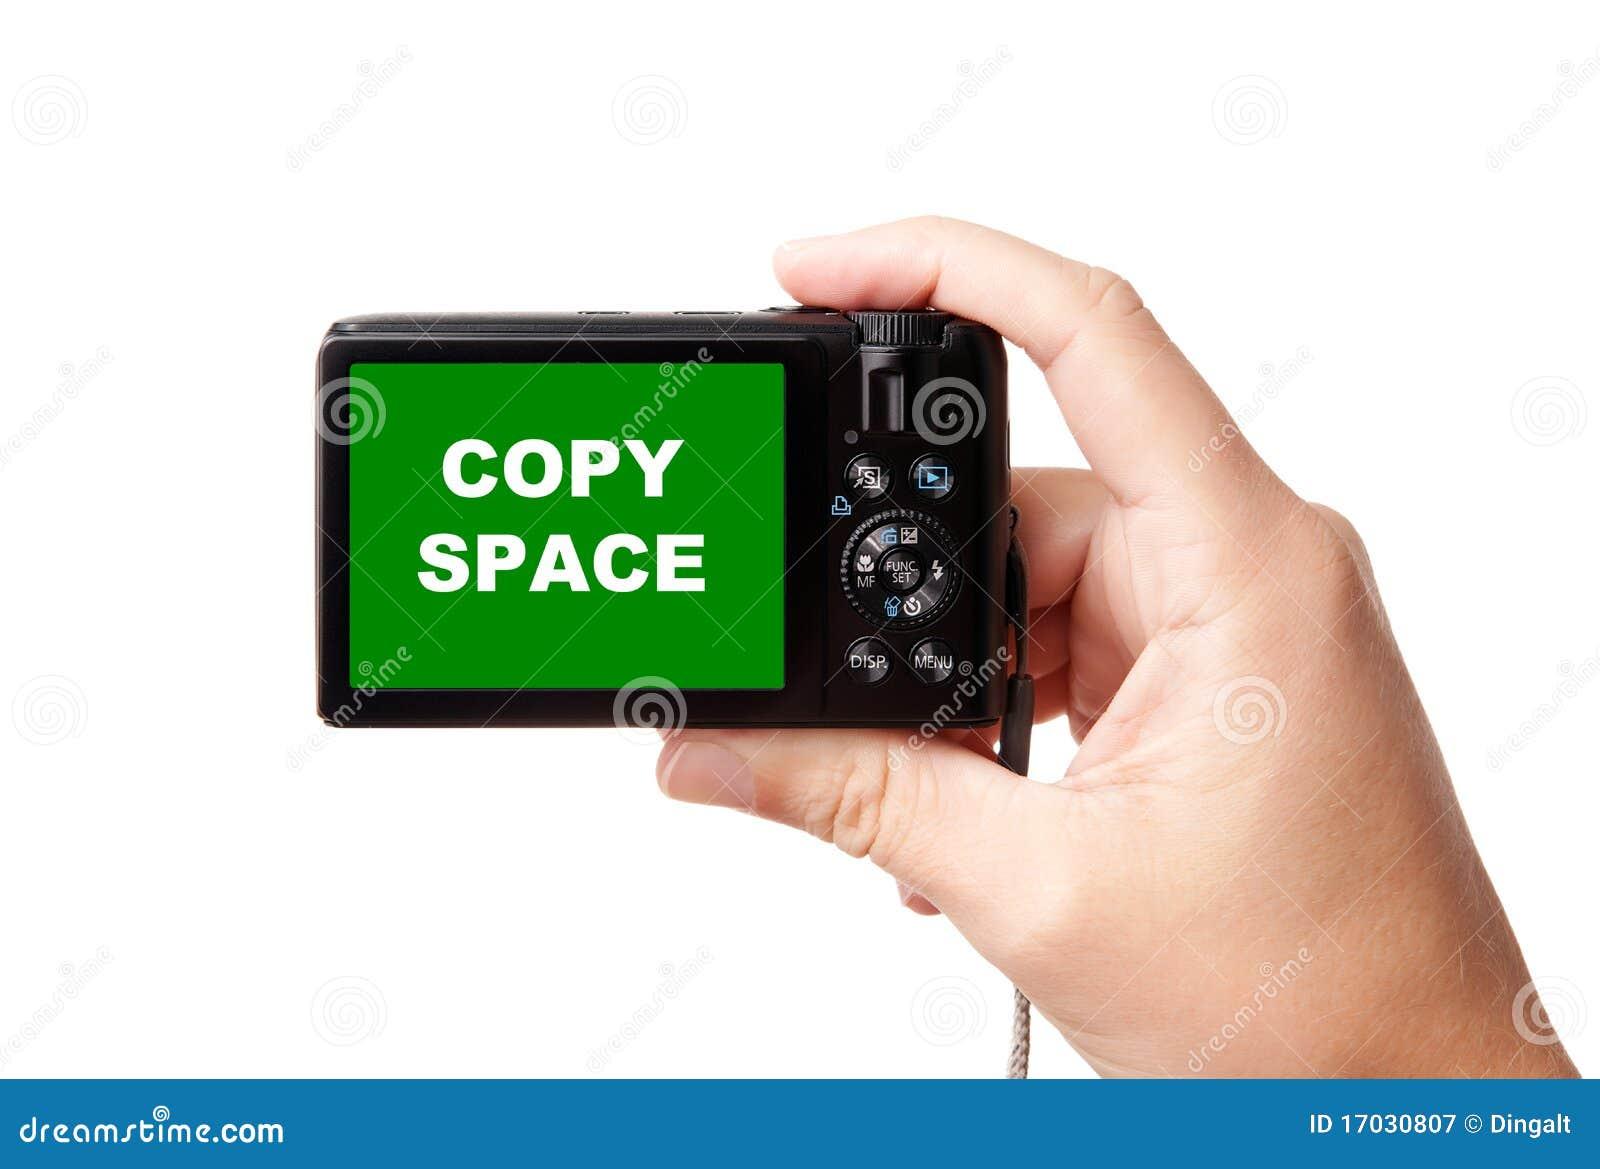 Hand holding modern digital camera